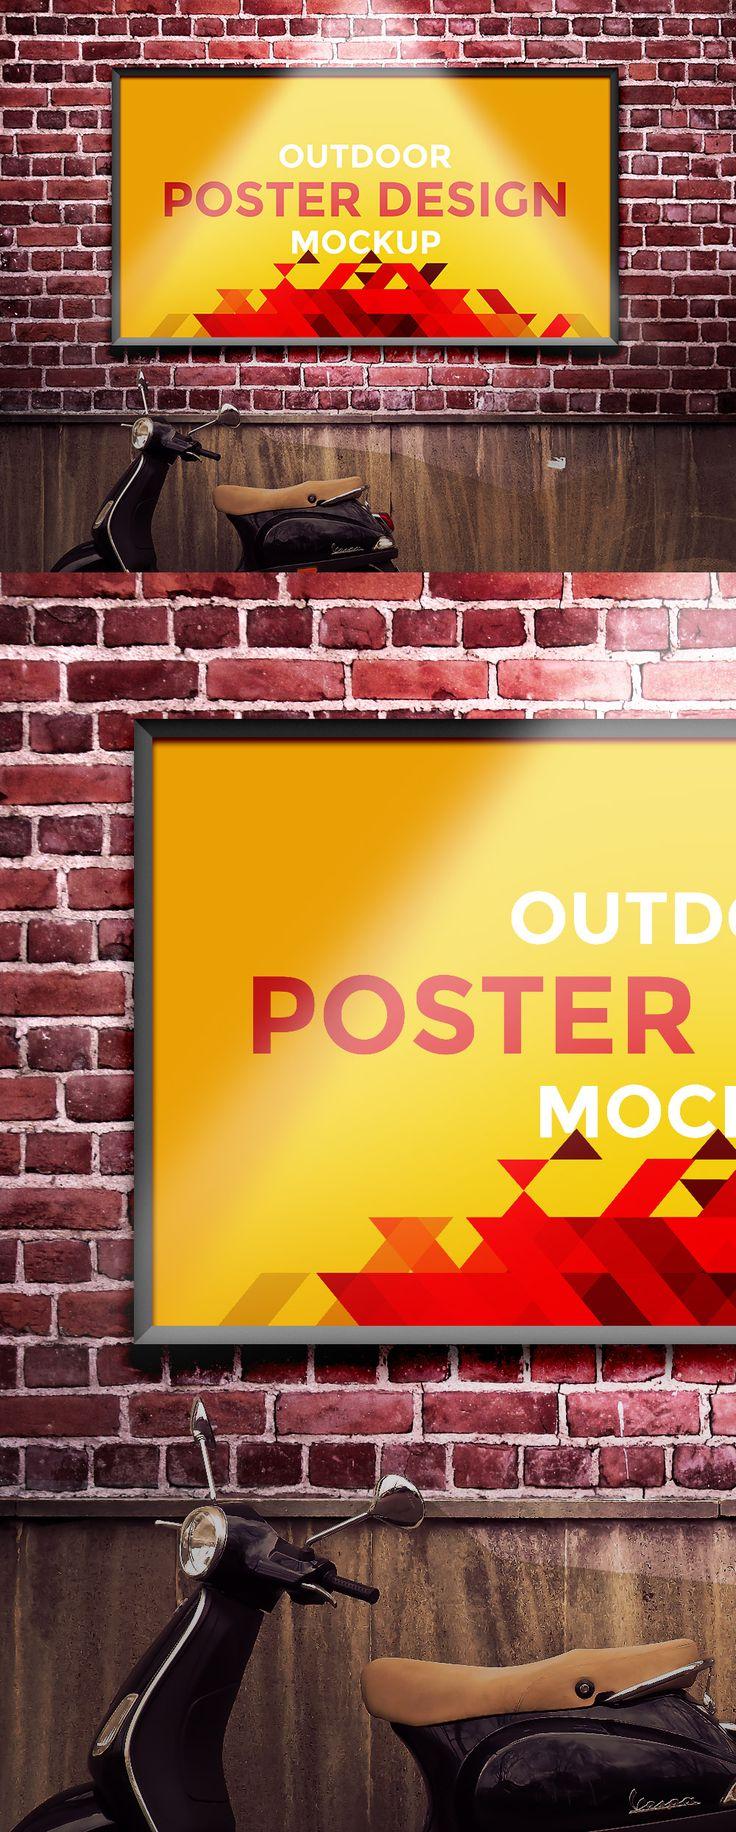 Poster design mockup - Free Outdoor Poster Design Mockup 64 7 Mb Graphics Fuel Free Photoshop Mockup Psd Outdoor Poster Mock Up Pinterest Graphics Mockup And